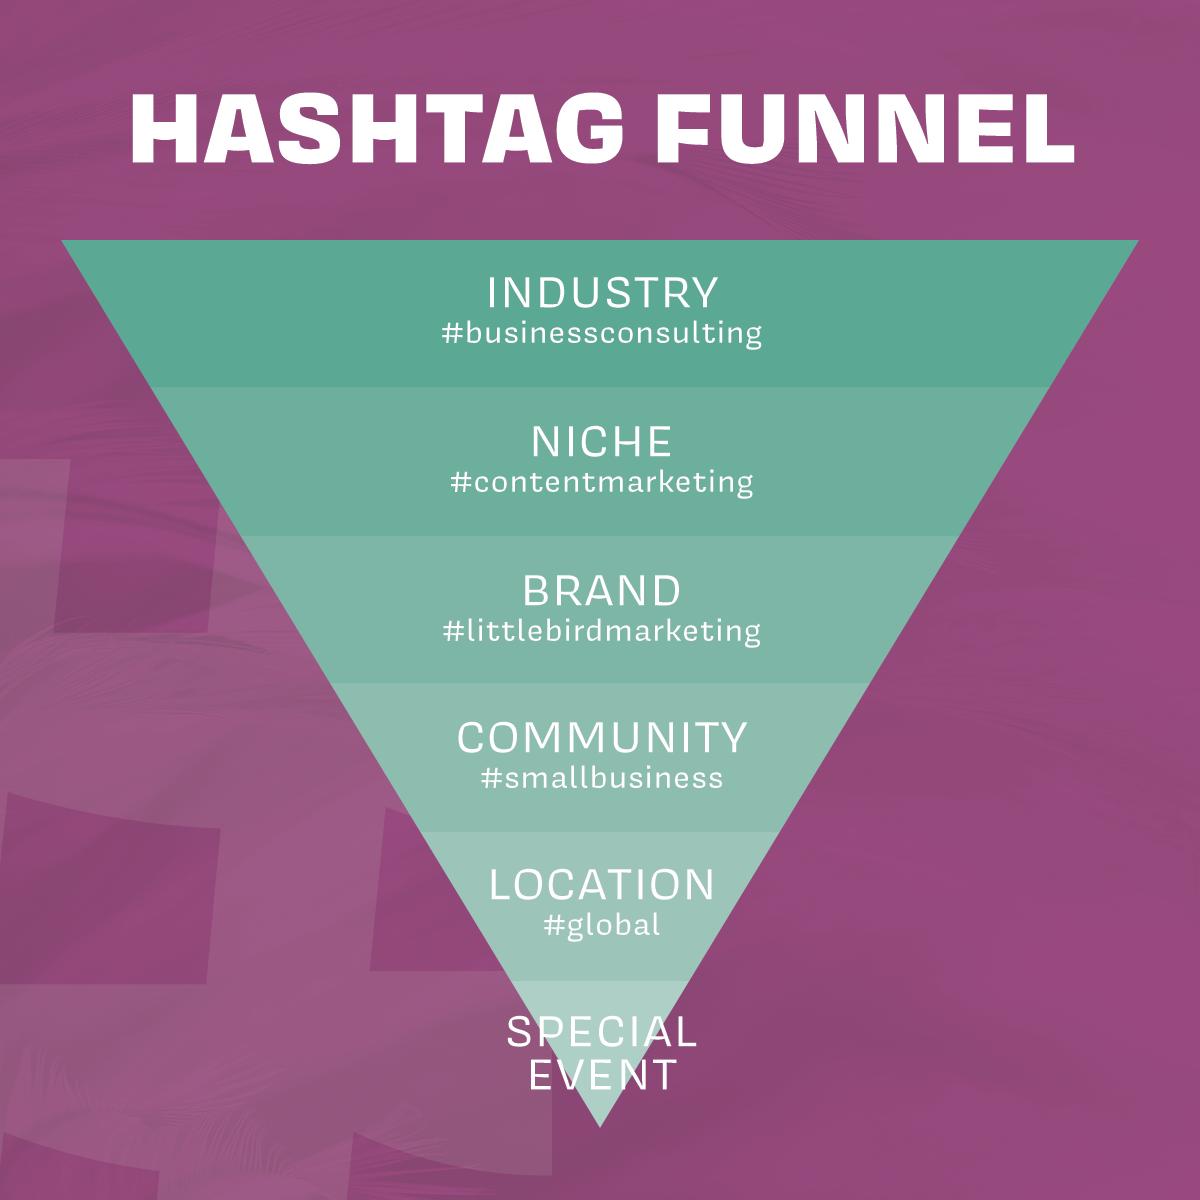 hashtag funnel